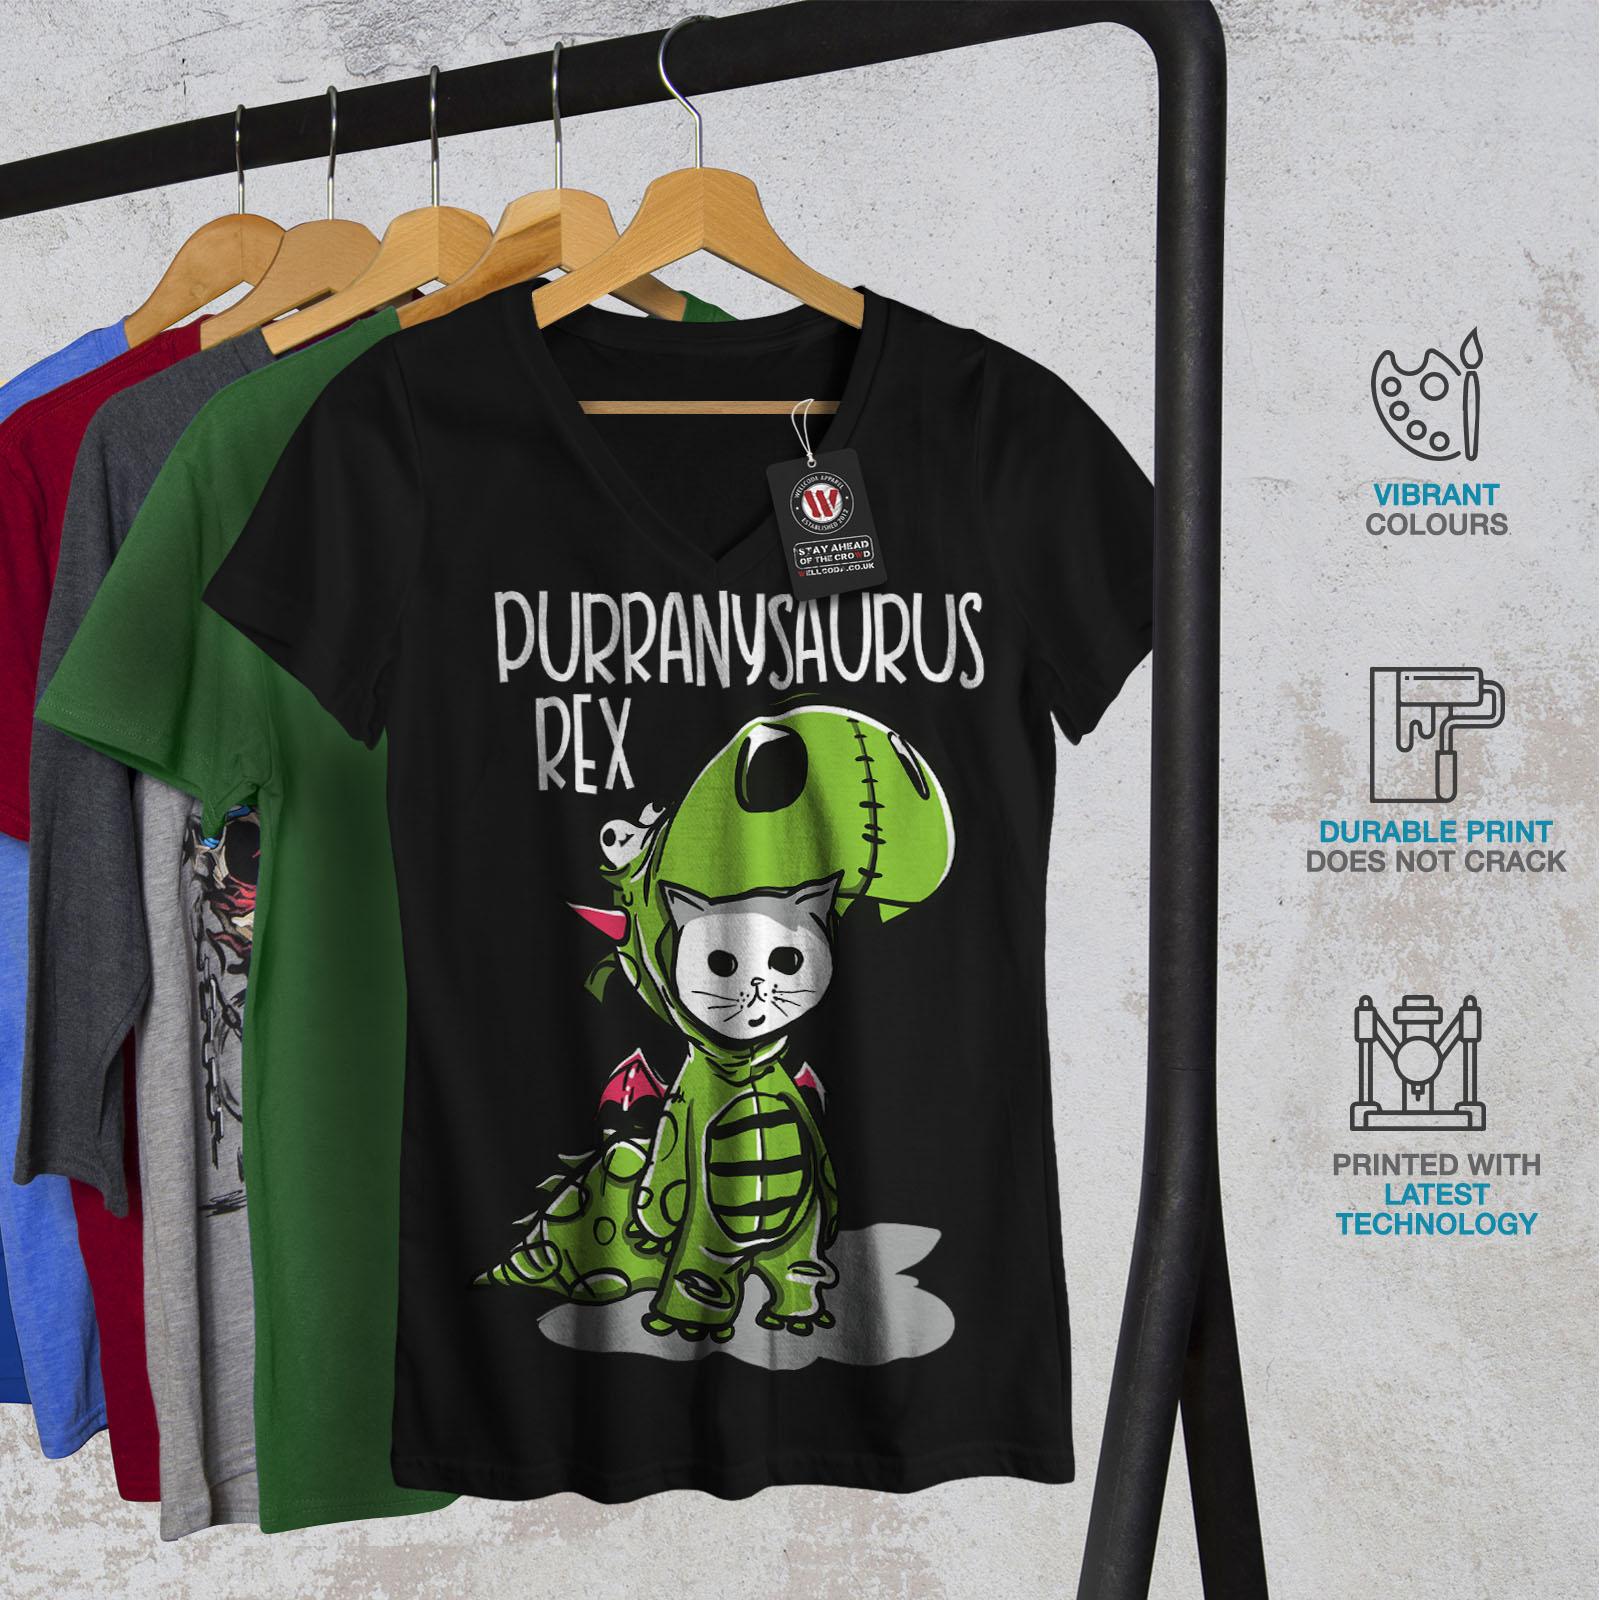 Carino-dinosauro-Donne-V-Neck-T-shirt-Nuove-wellcoda miniatura 4